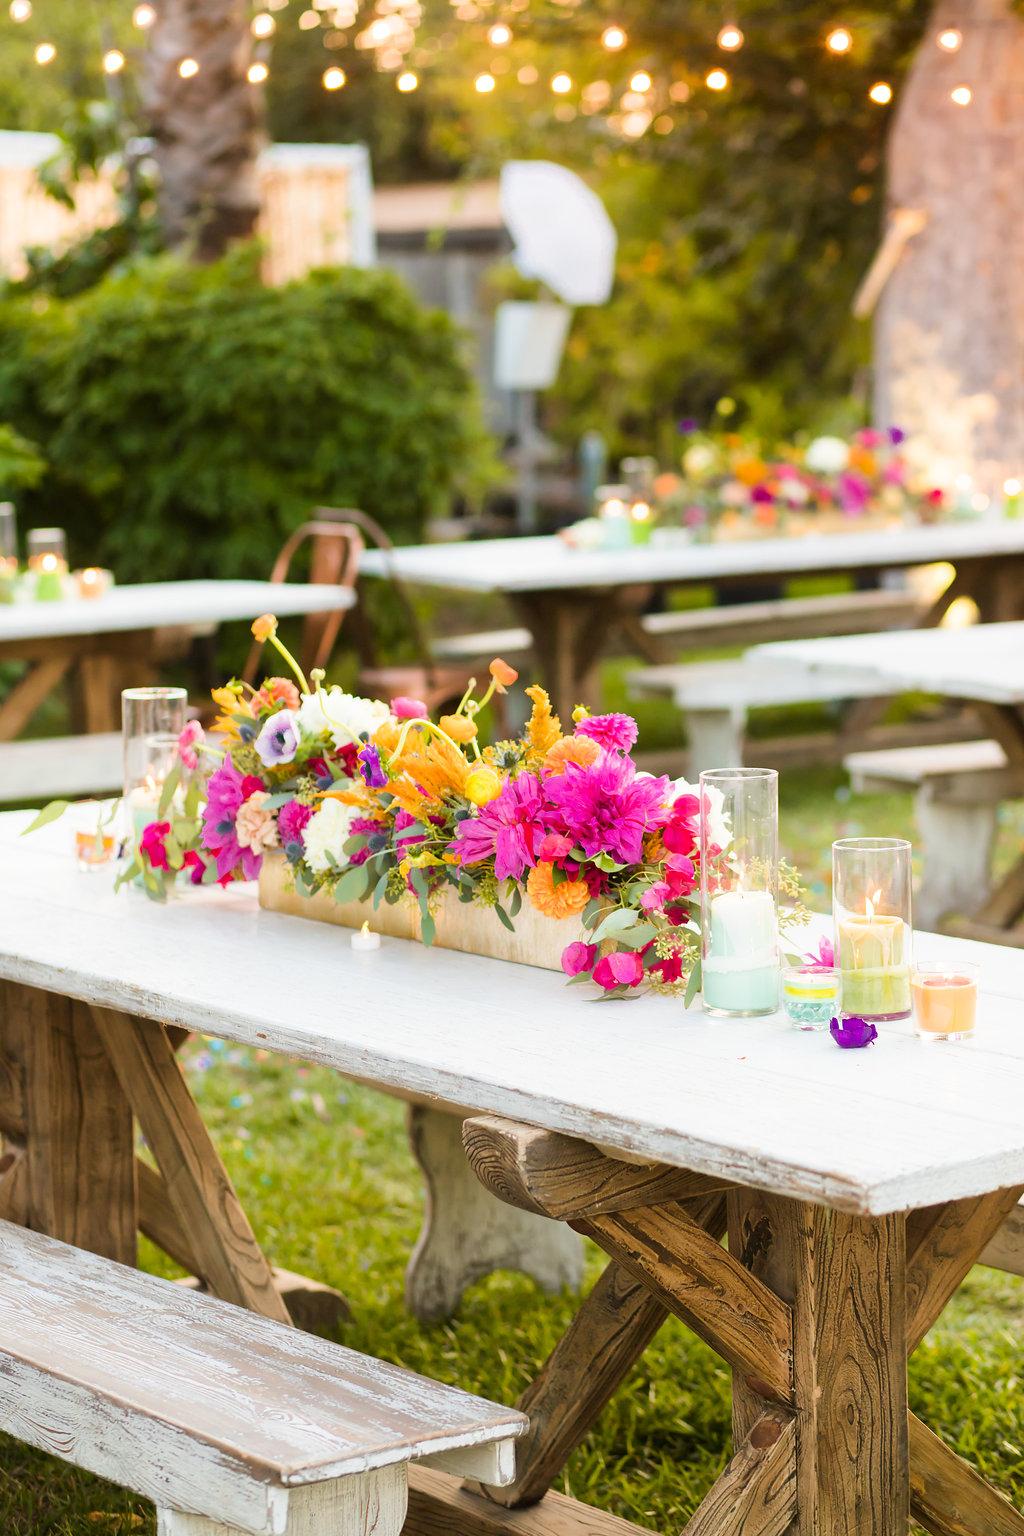 LA-photobooth-open-air-flowers